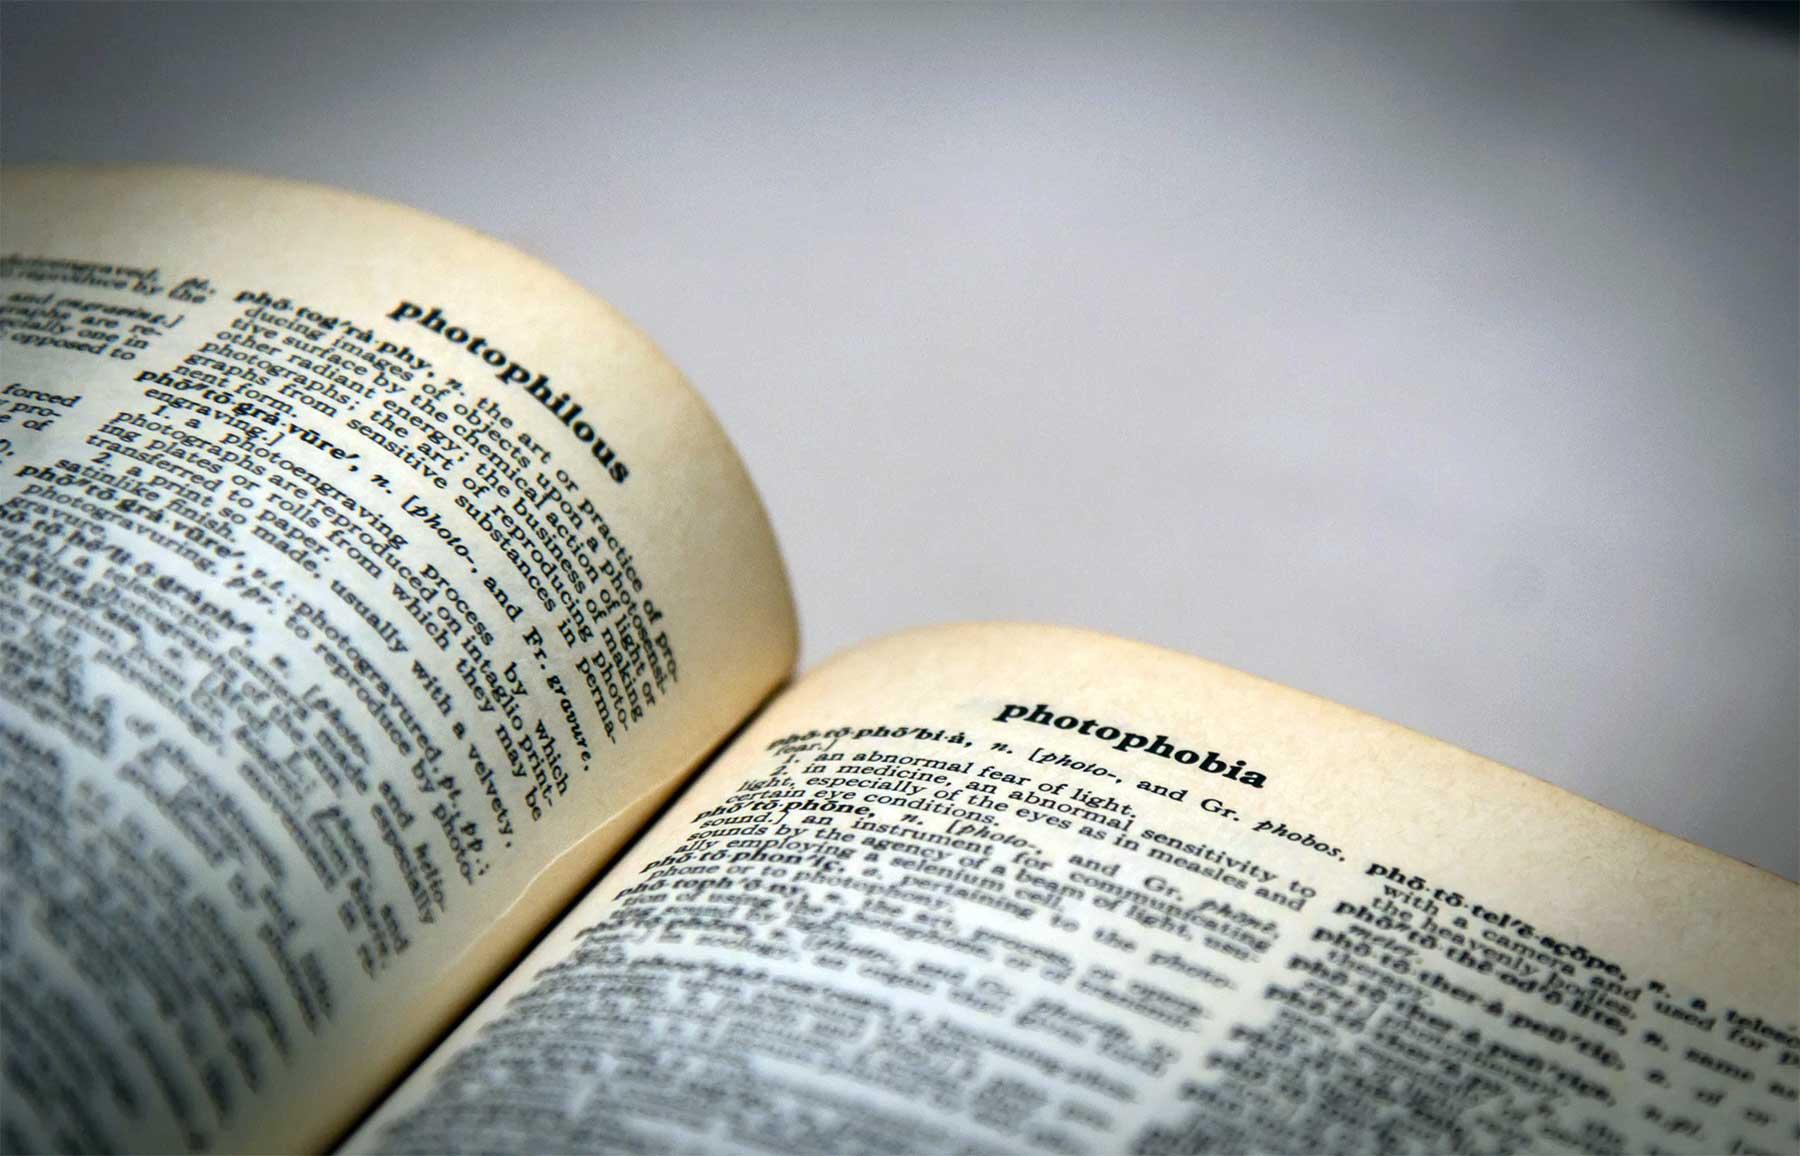 Das Fremdwörterlexikonspiel